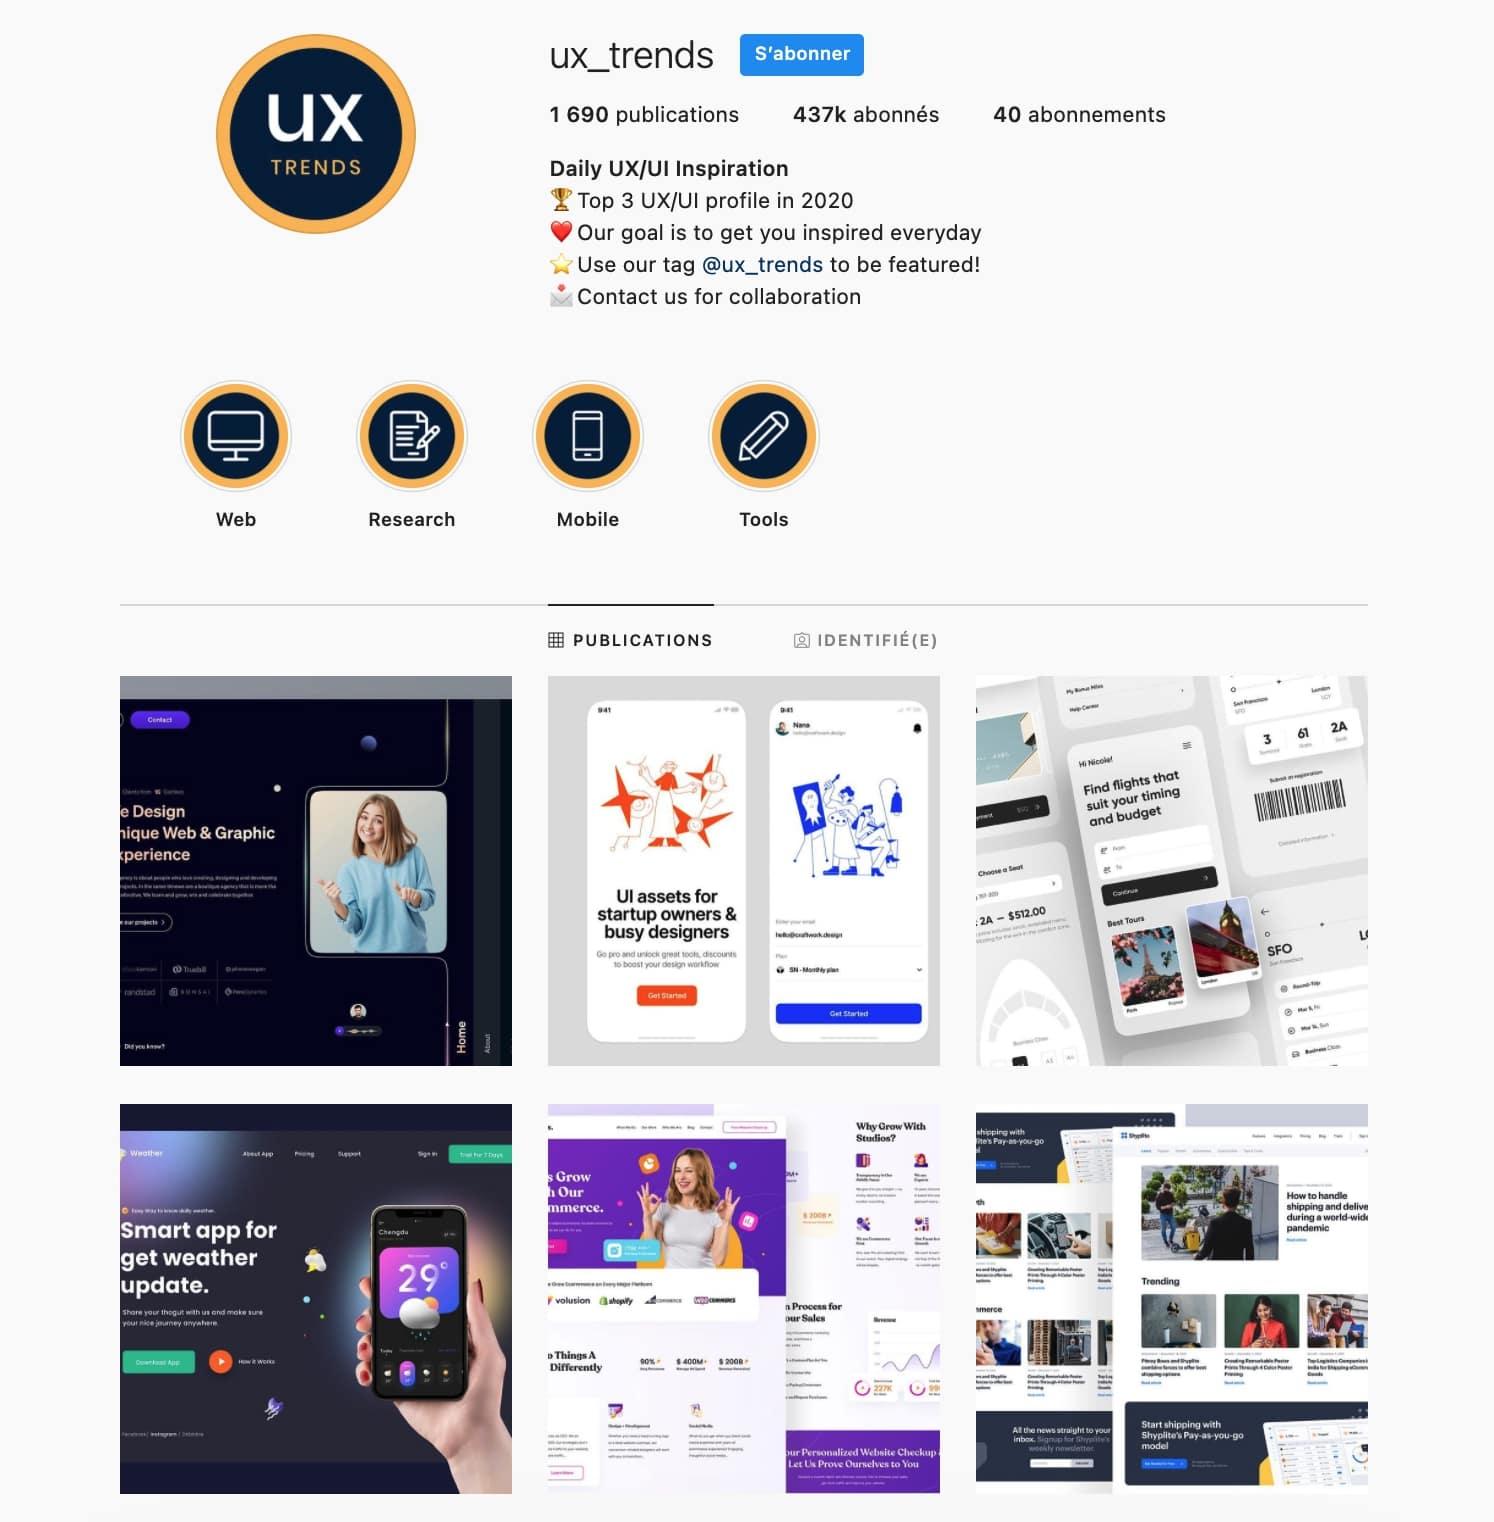 Exemple de compte inspiration UX/UI : UX trends : repost de différentes maquettes UX